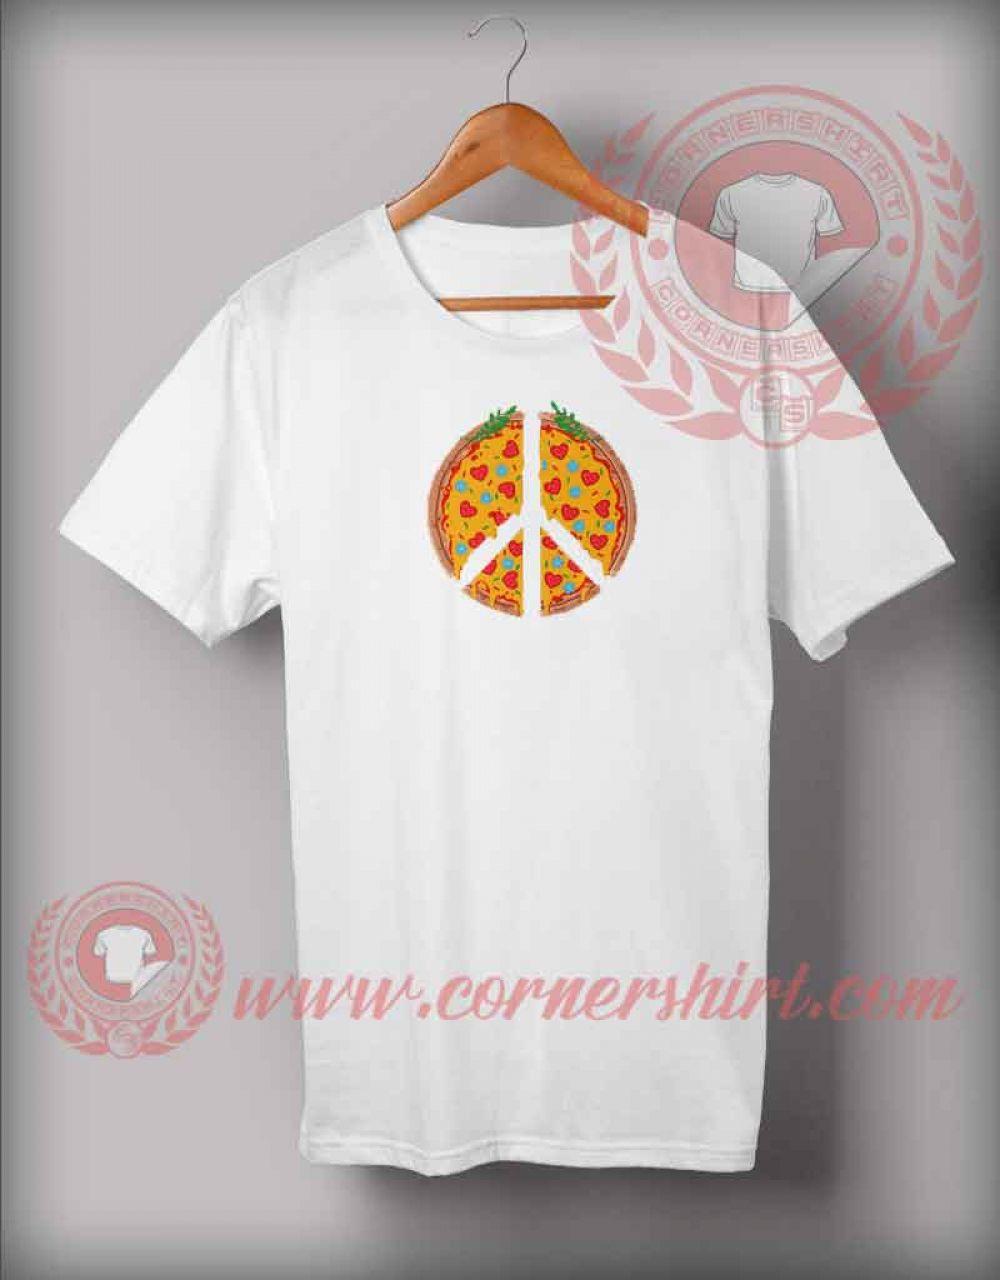 96fc2ee26487 Rational Family Reunion Clearwater Logo in 2019   Logo T shirts   Shirts, T  shirt, Logos